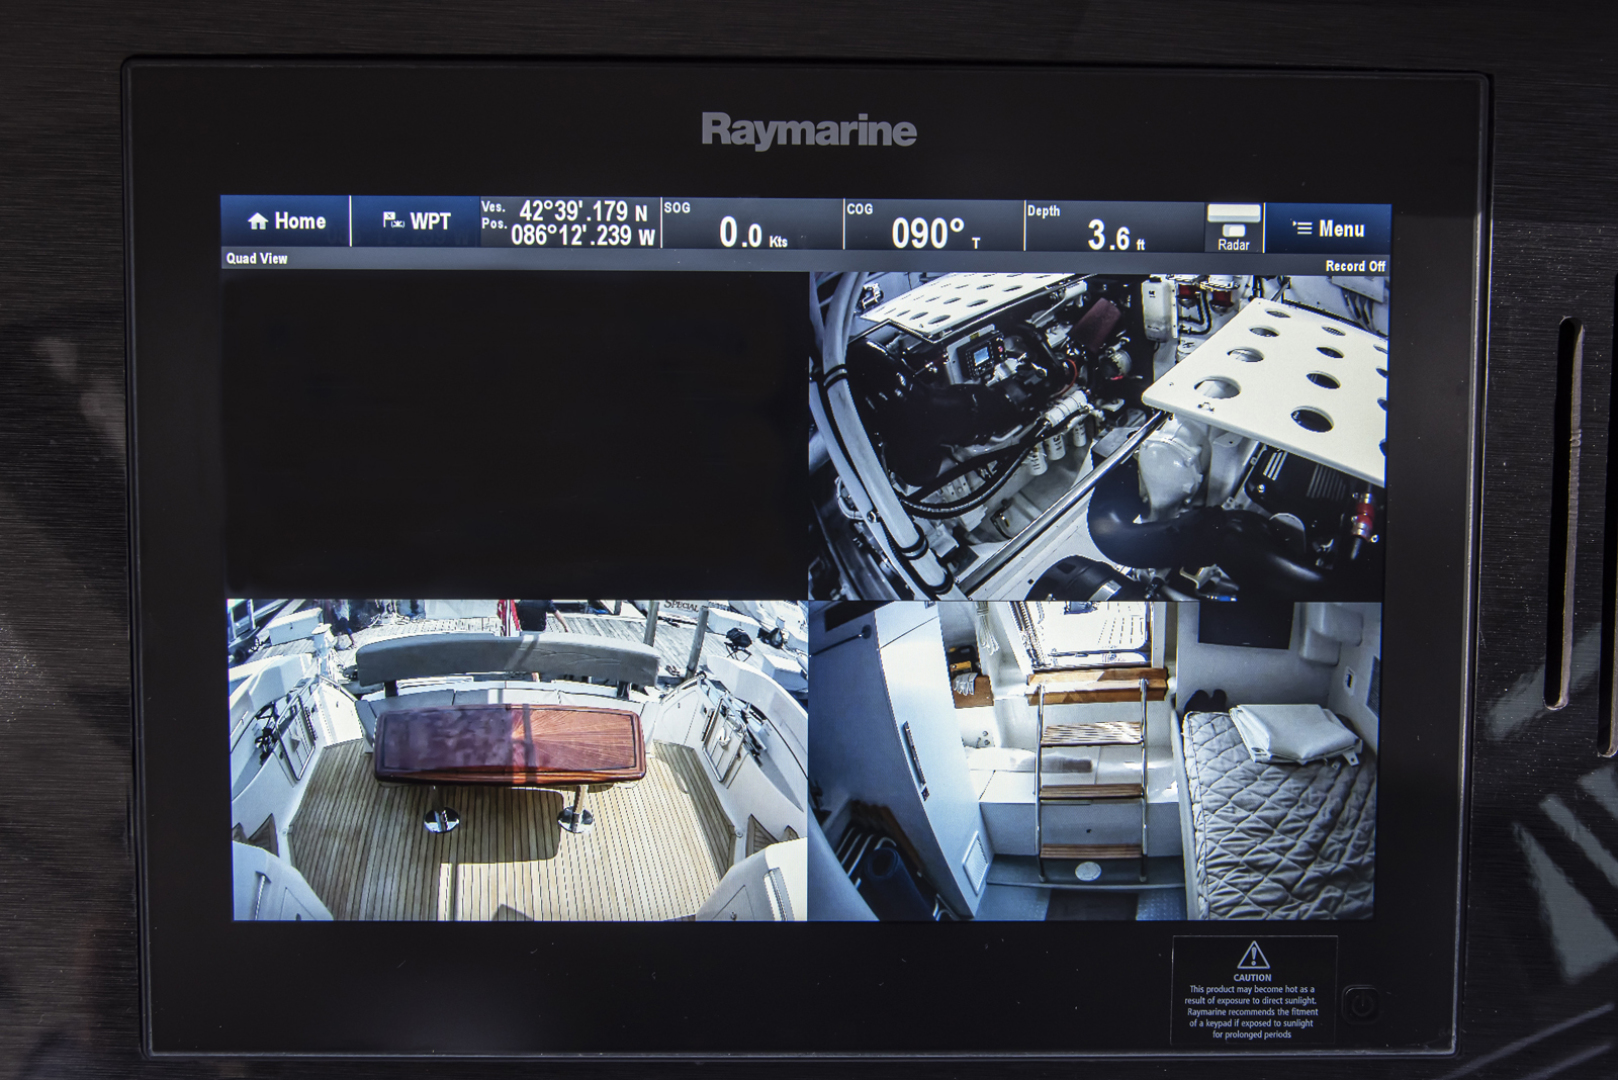 Neptunus-Motor Yacht Express 2018-LIQUID WISDOM Grand Haven-Michigan-United States-CCTVS on MFD-1484972 | Thumbnail